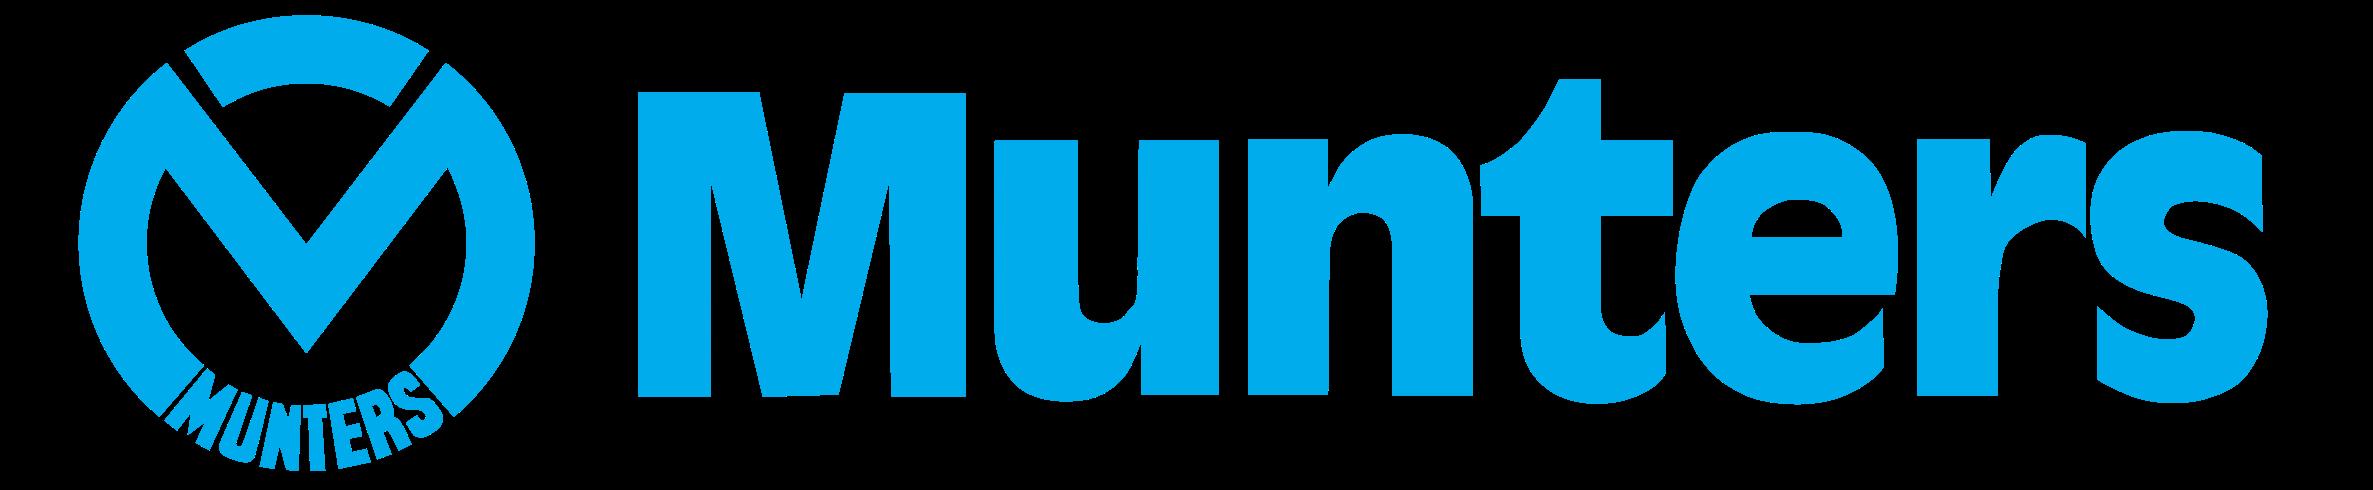 munters-logo-png-transparent